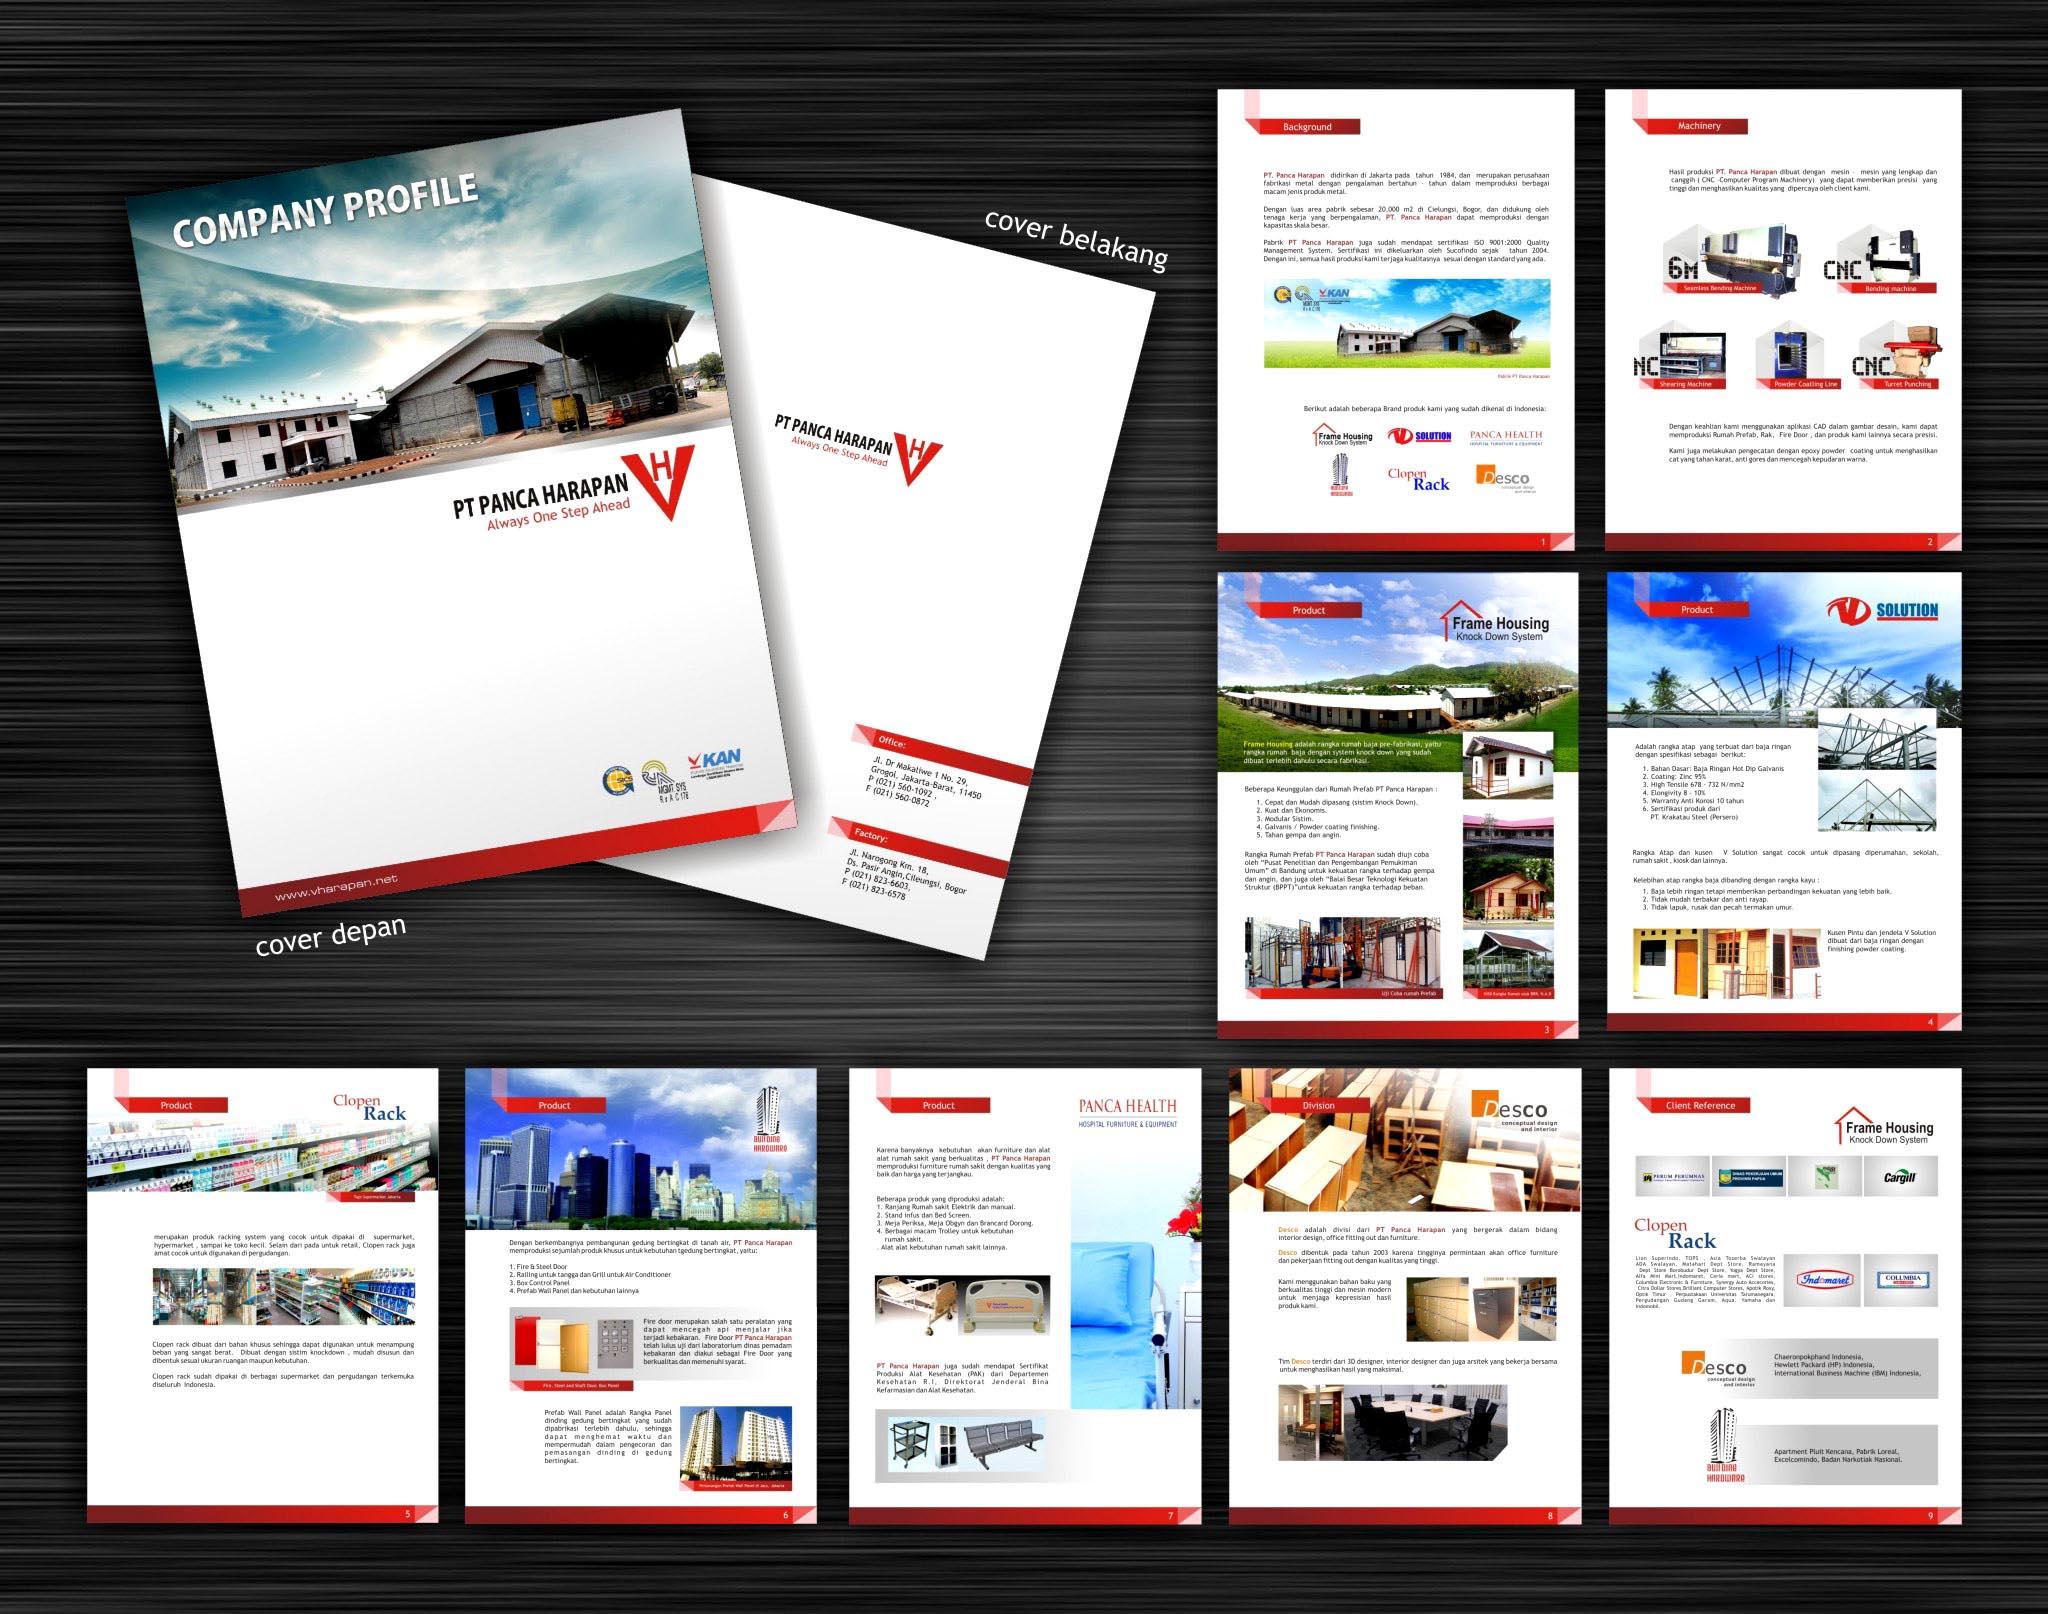 Gallery Desain Company Profile Panca Harapan